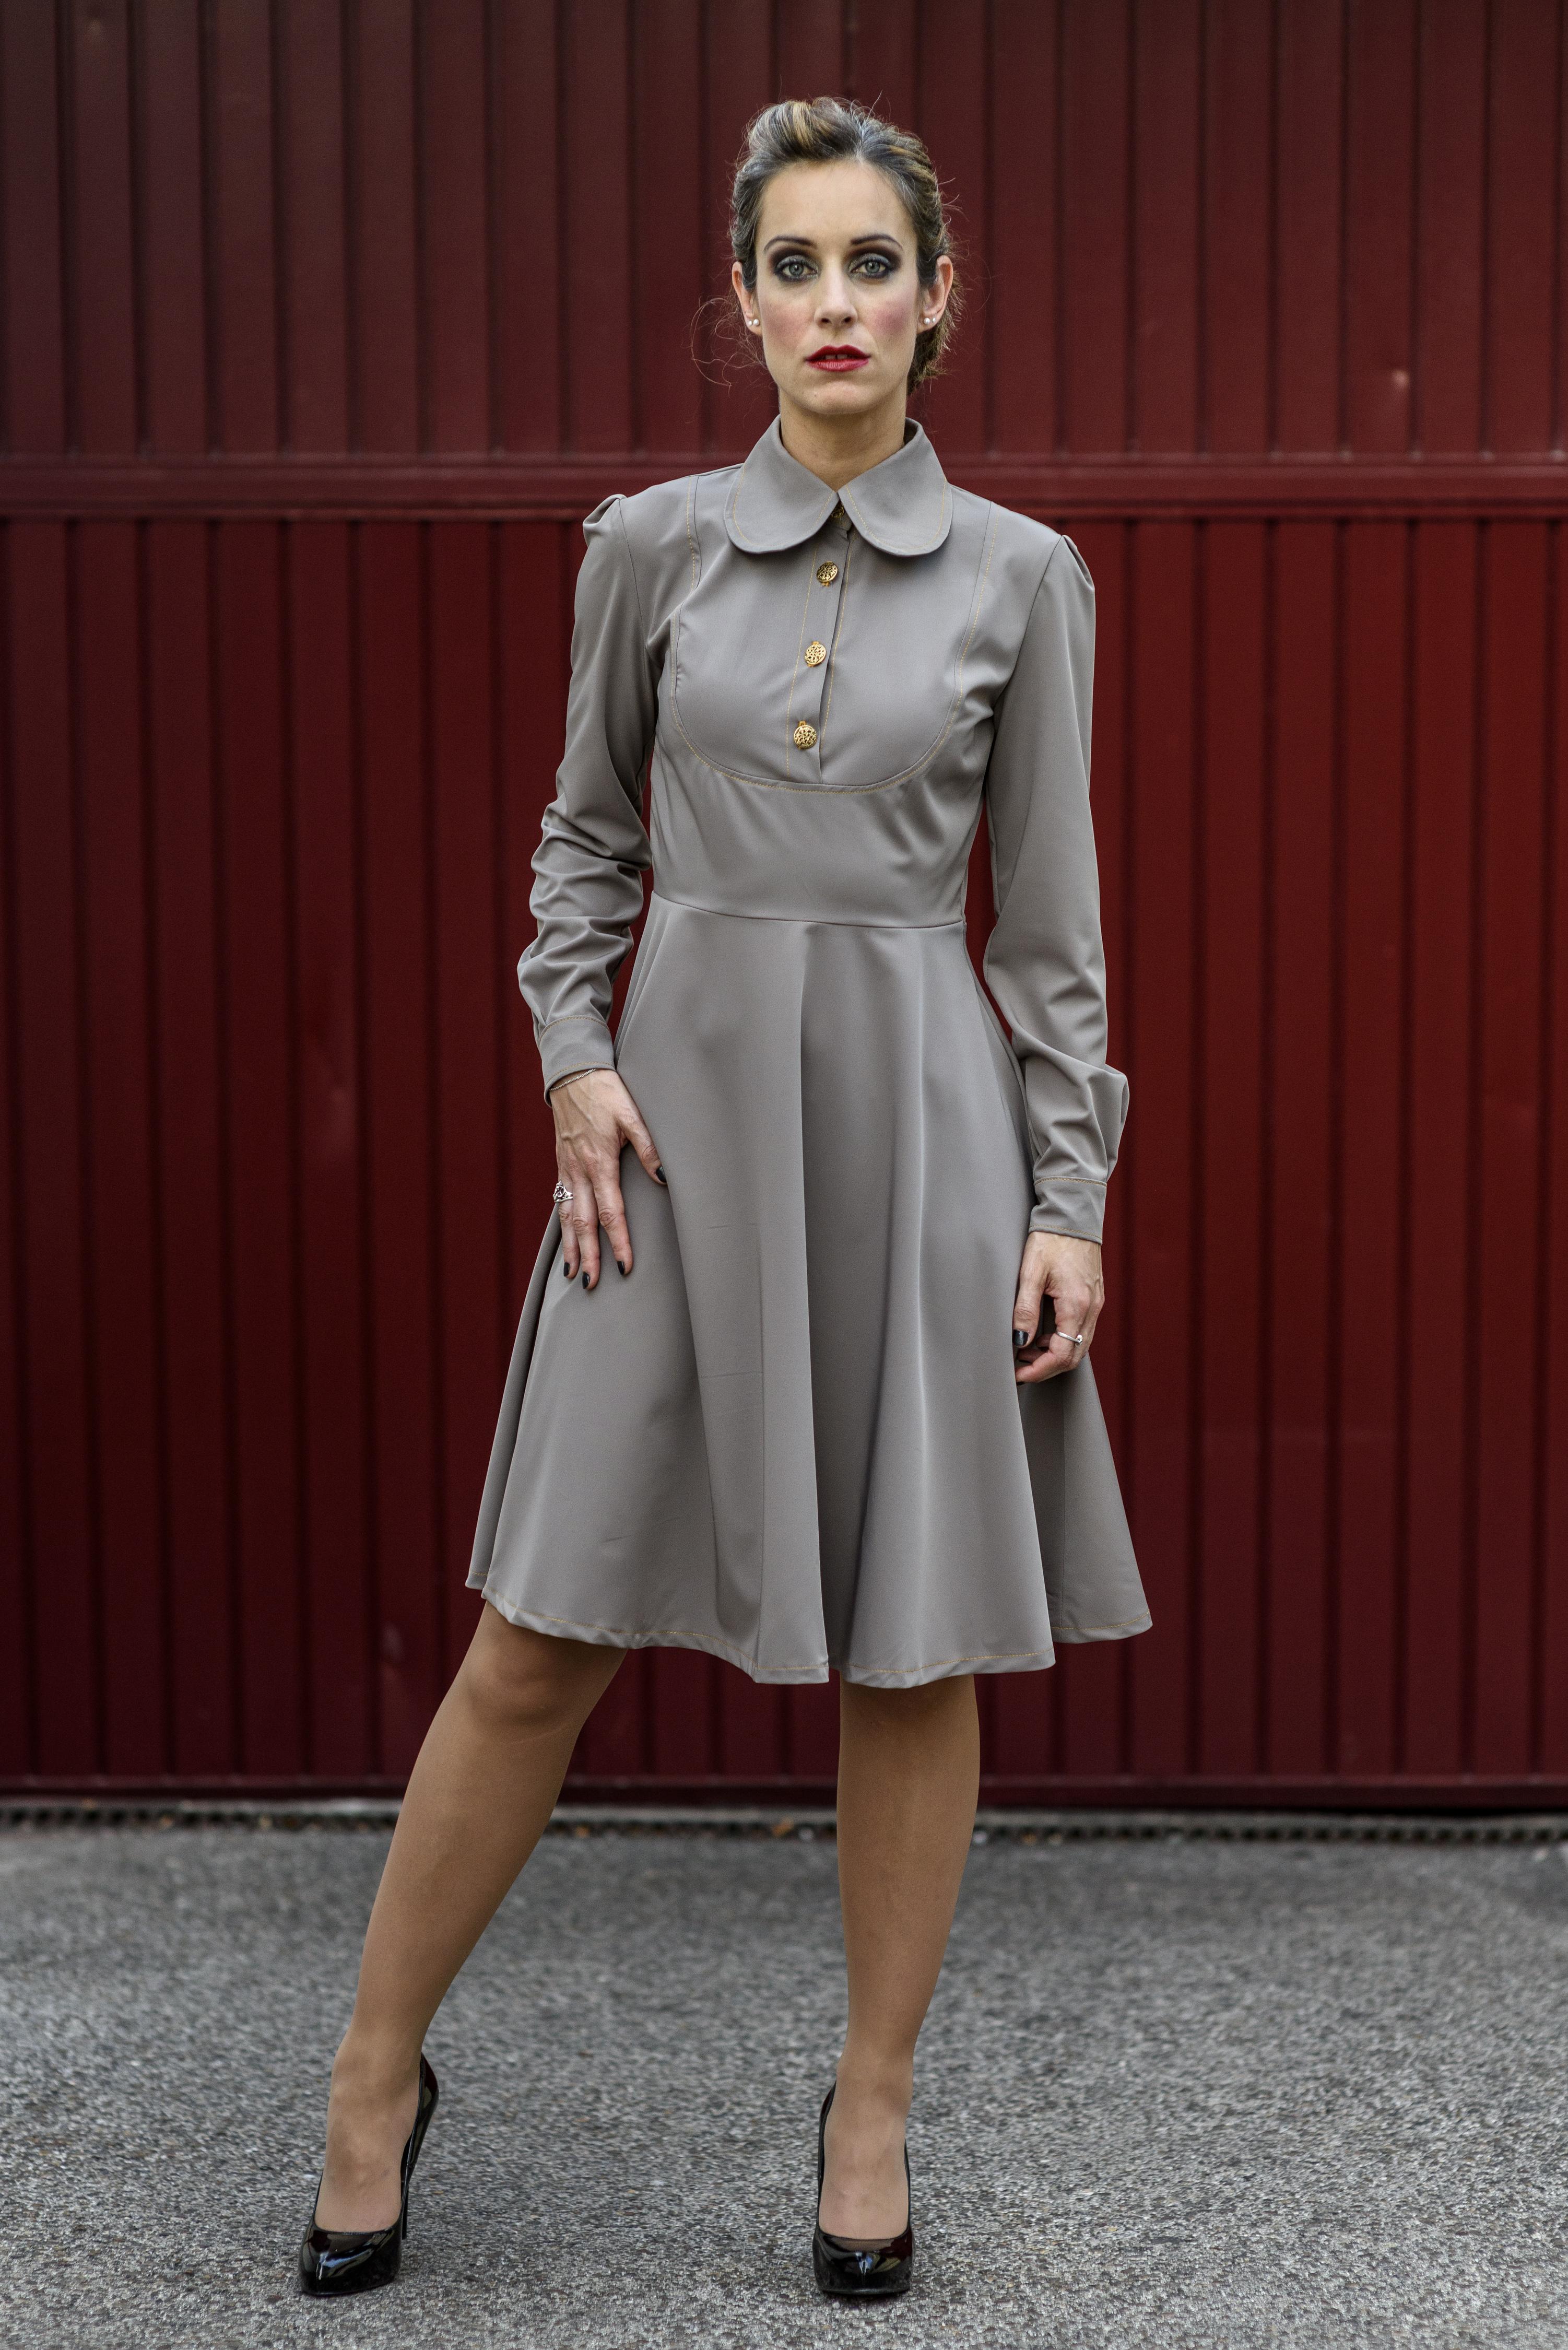 f507a0175 ... Vestido gris de manga larga Runaway. 🔍. Hot. Añadir ...